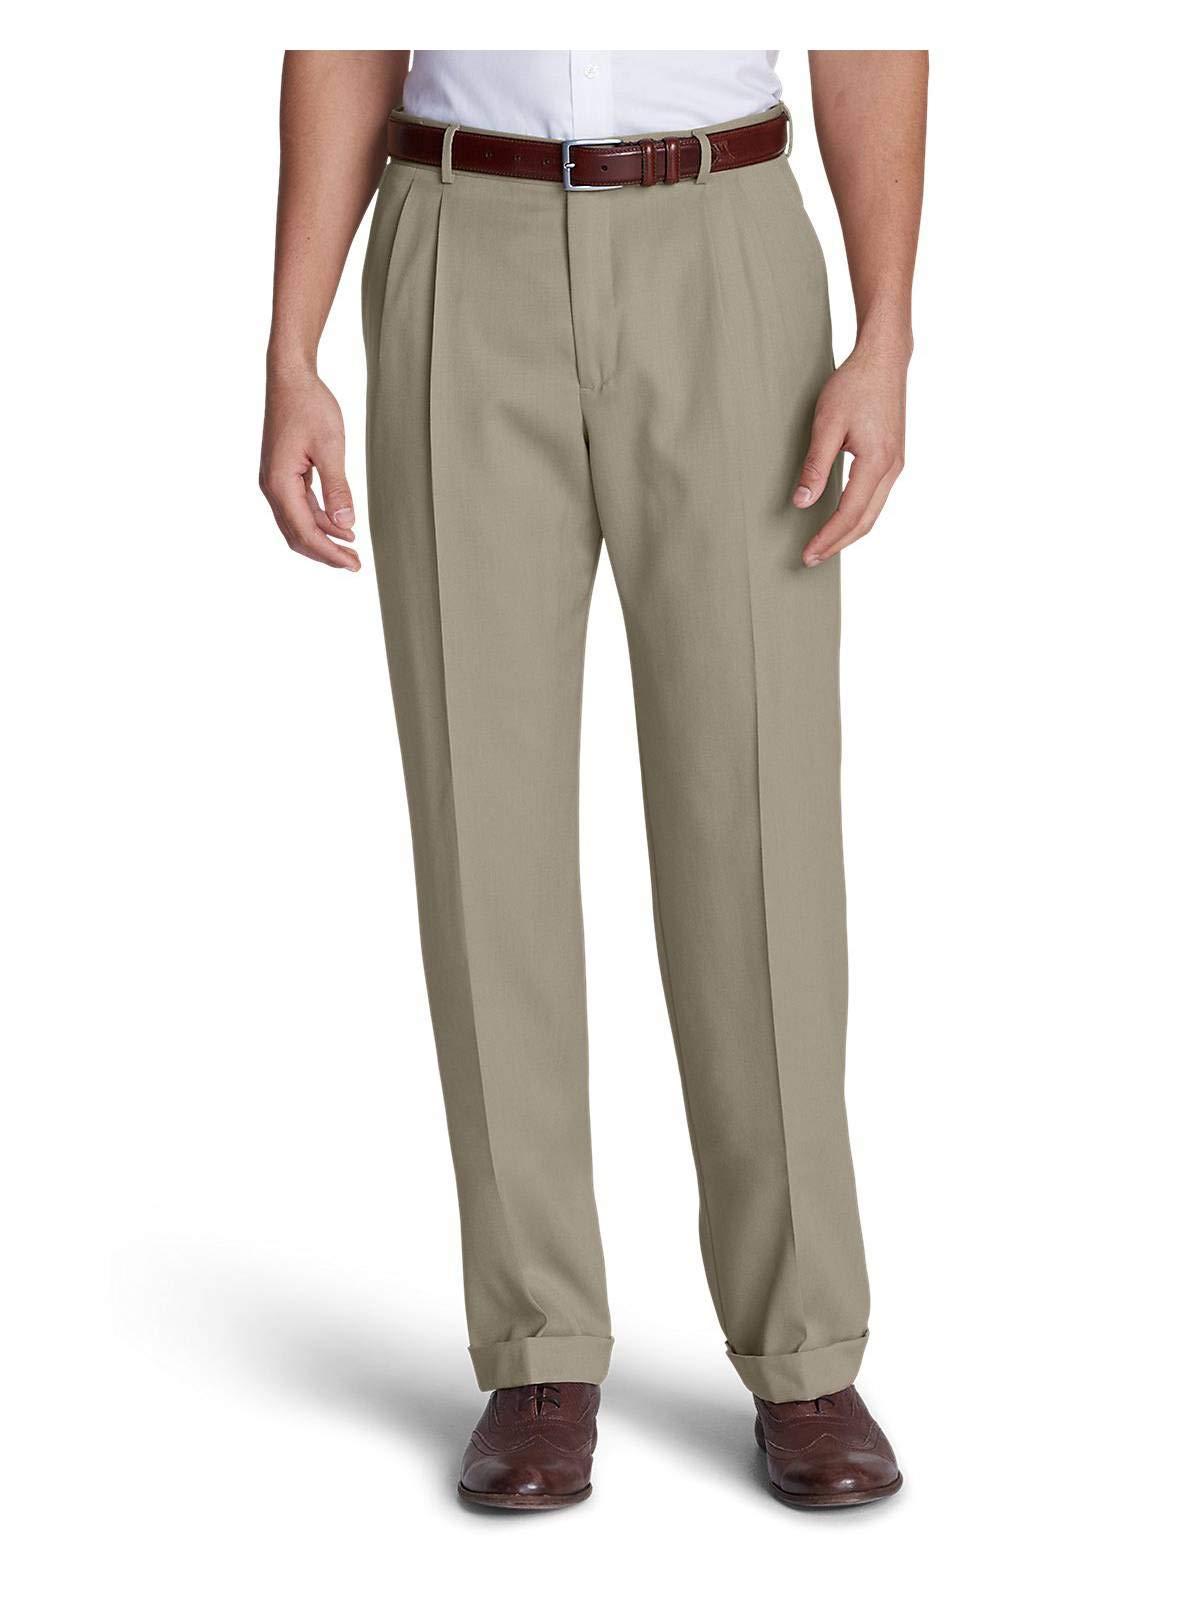 Eddie Bauer Men's Wool Gabardine Trousers - Pleated, Tan Tall 46